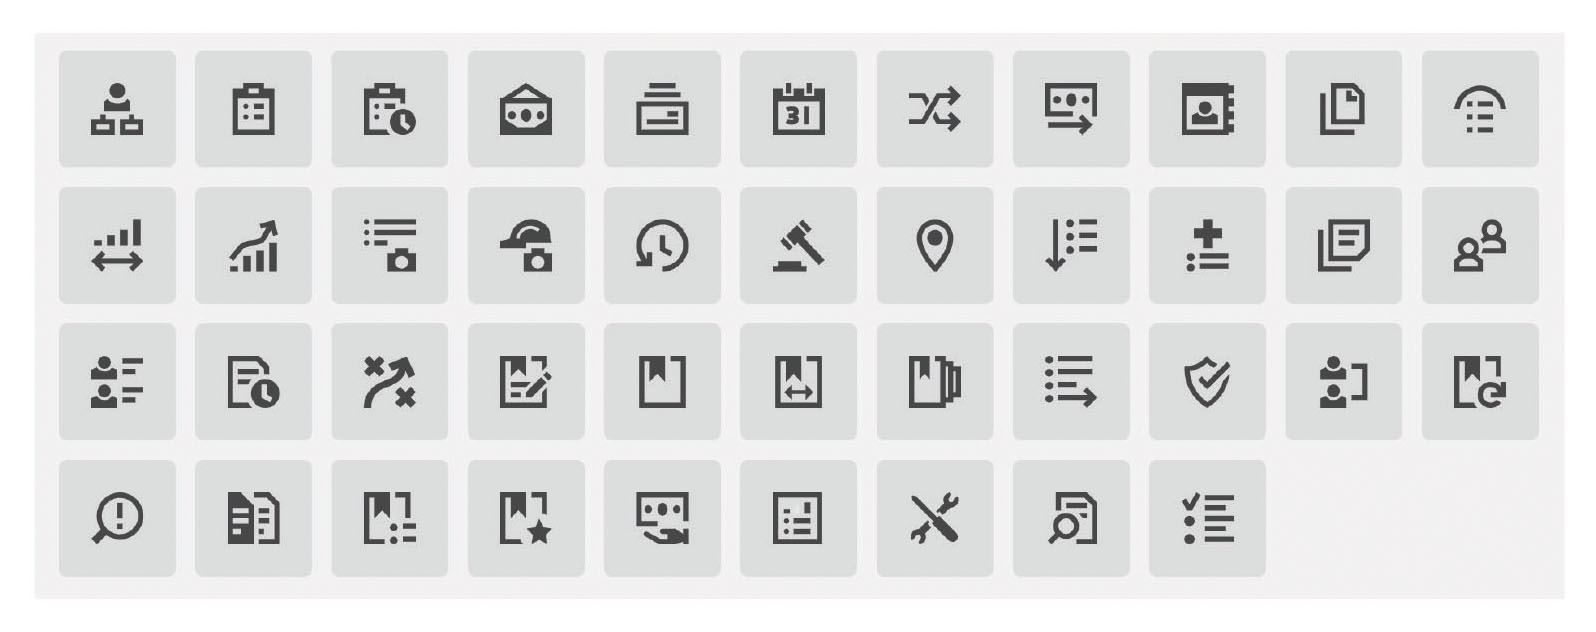 icon2-1